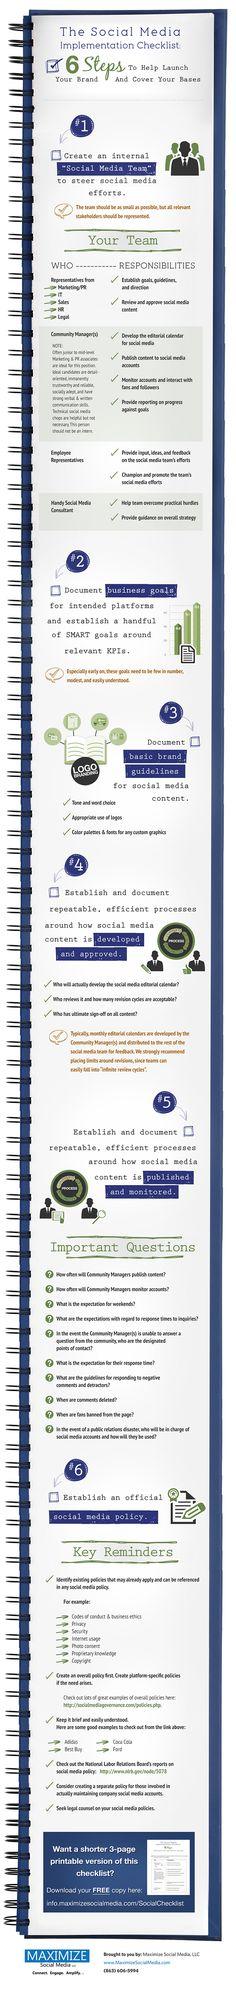 SOCIAL MEDIA - The Social Media Implementation Checklist | Maximize Social Media Infographic.